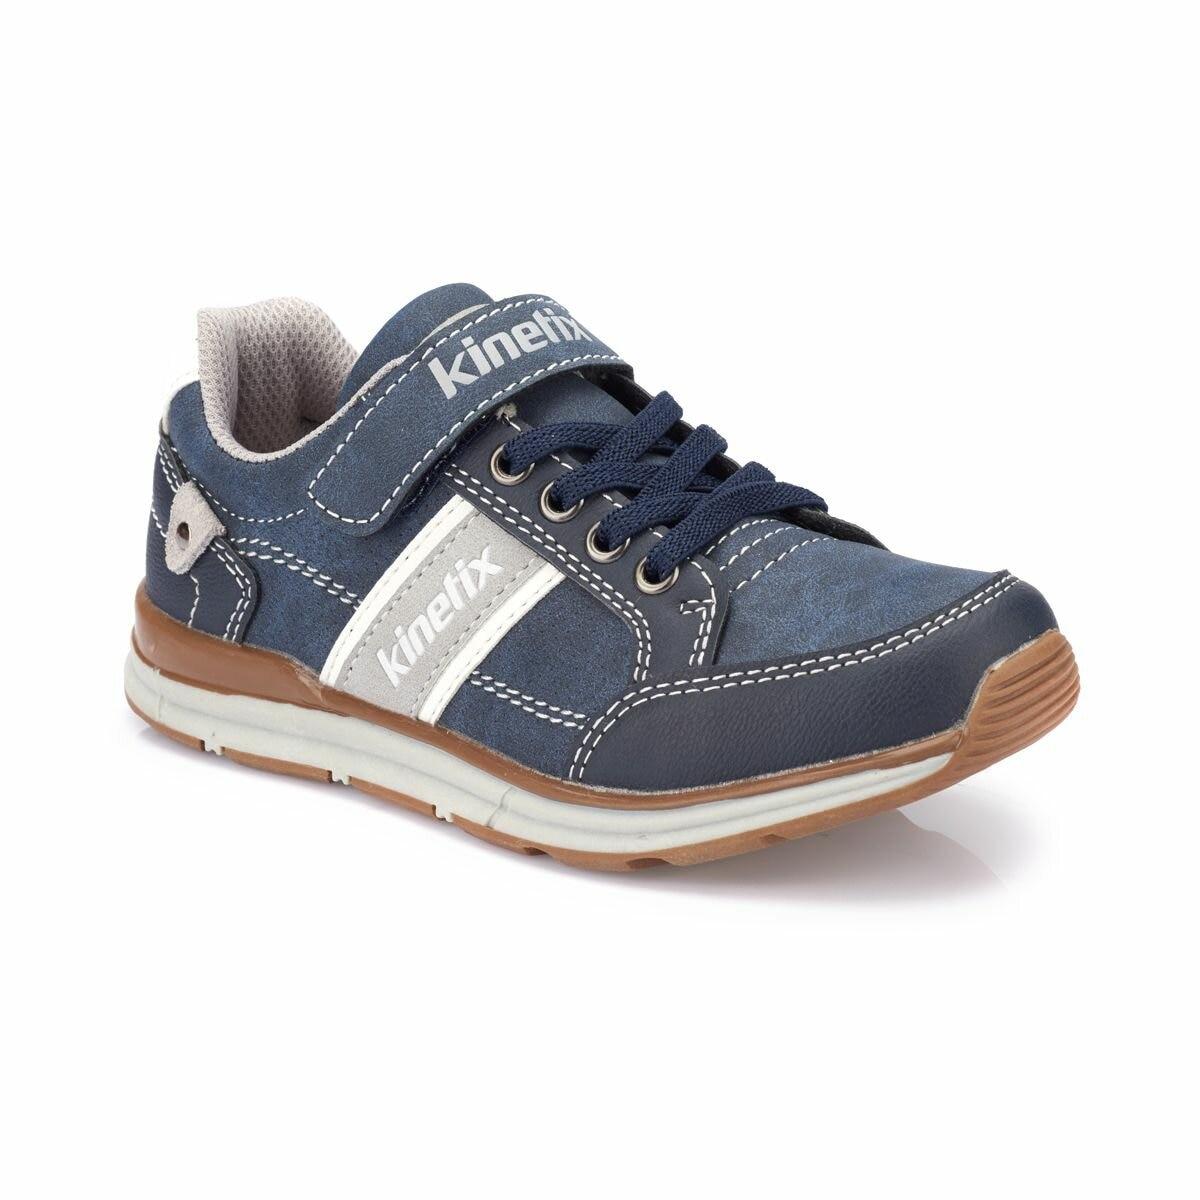 FLO ALFONI Navy Blue Male Child Sneaker Shoes KINETIX